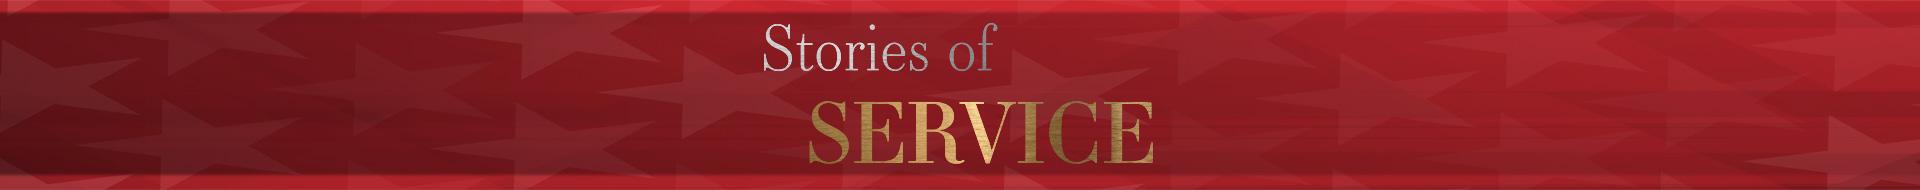 Storiesof Service